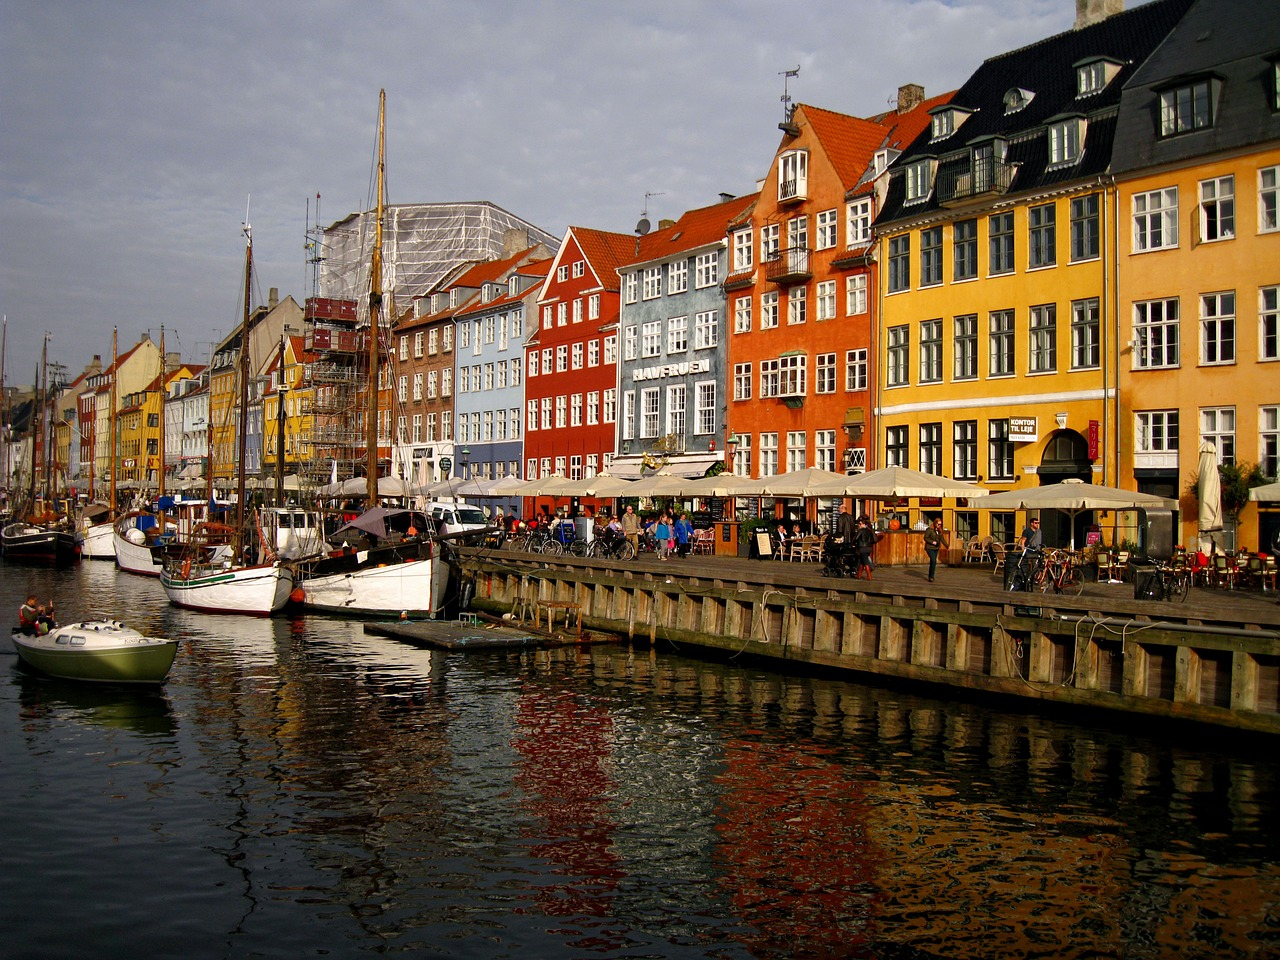 Hygge, 2 trucs ultra positifs à piquer aux danois